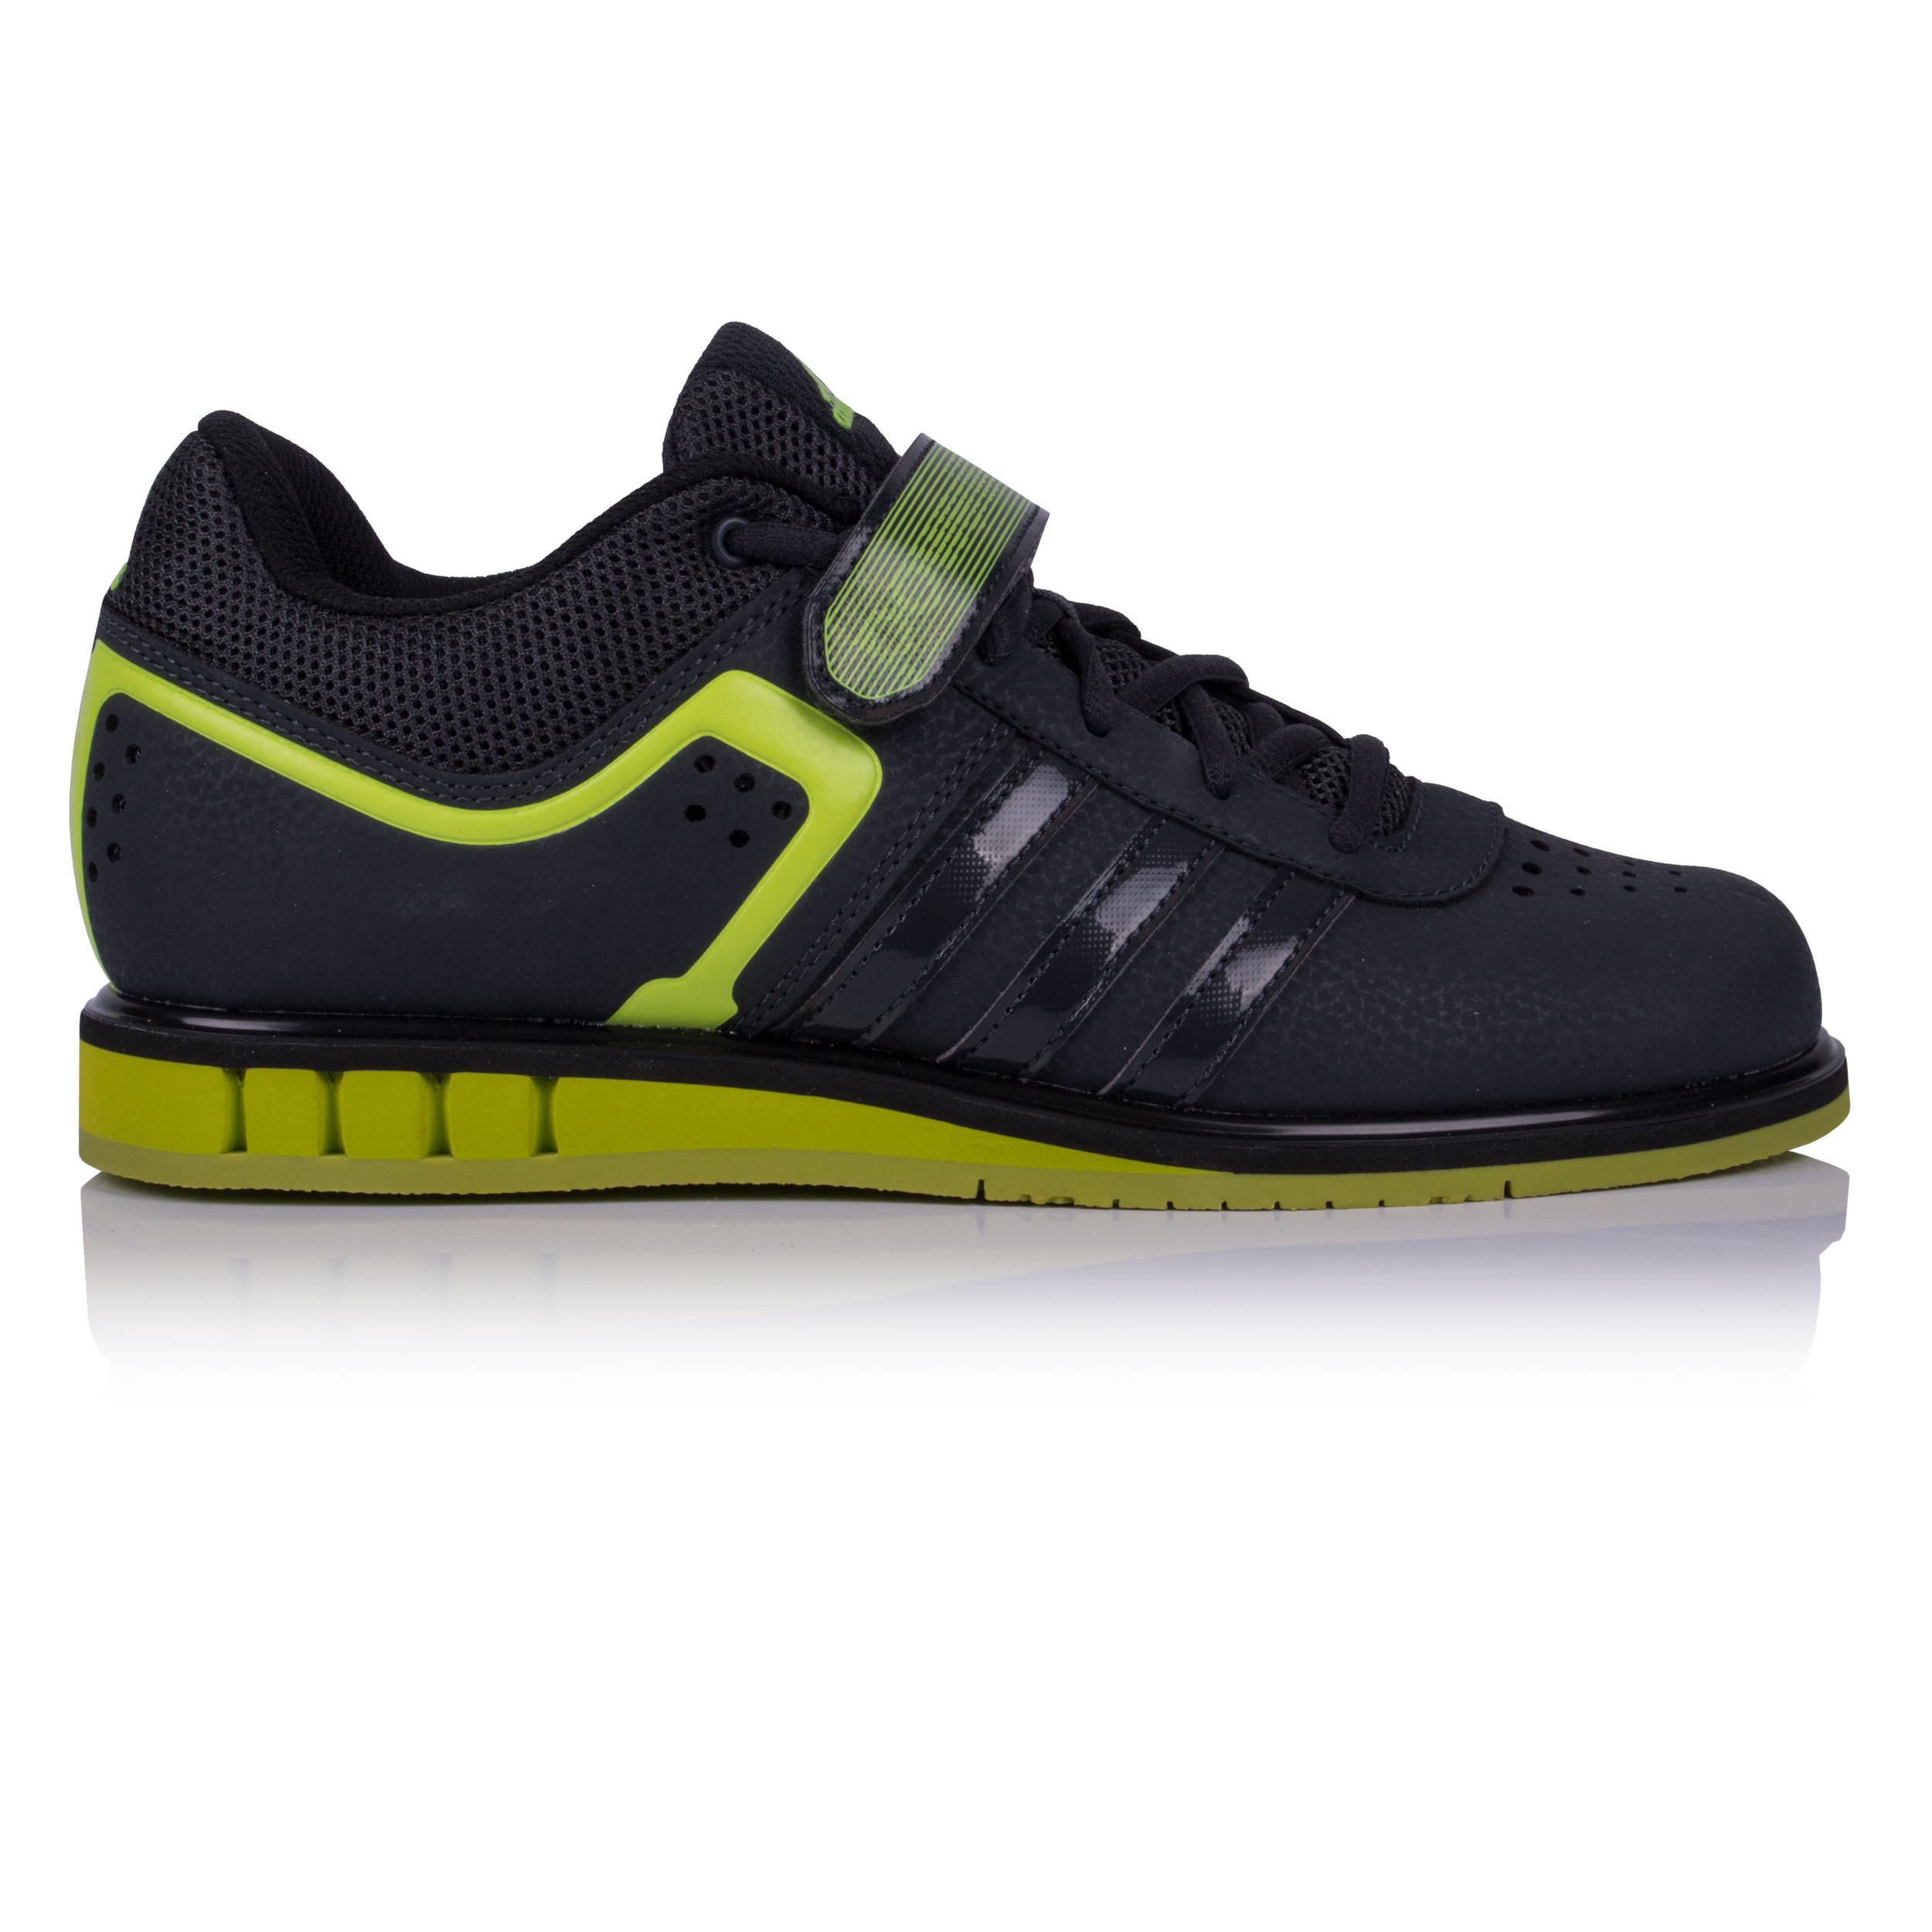 3293b078c50 Adidas Hommes Powerlift 2.0 Chaussures De Haltérophilie Noir Vert Sport Gym